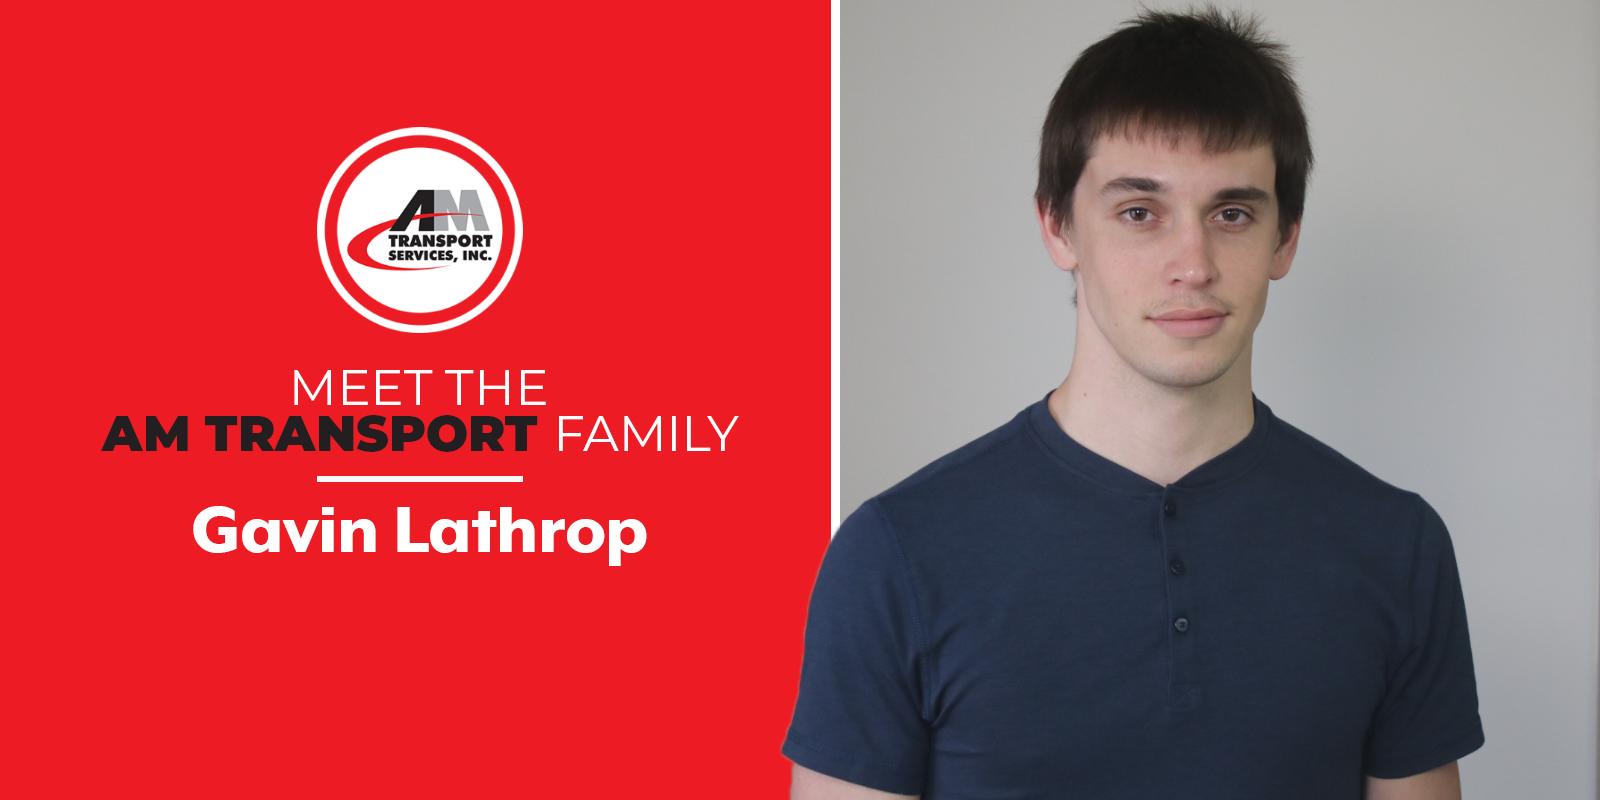 Meet the Team: Gavin Lathrop